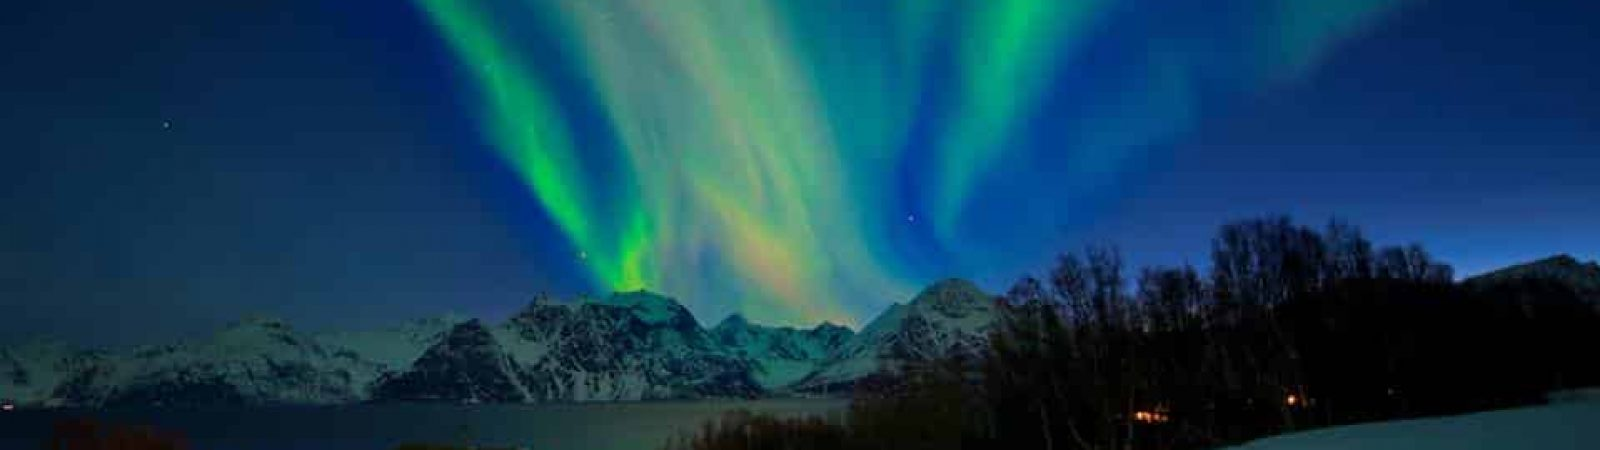 Northern lights in the Lyngen Alps